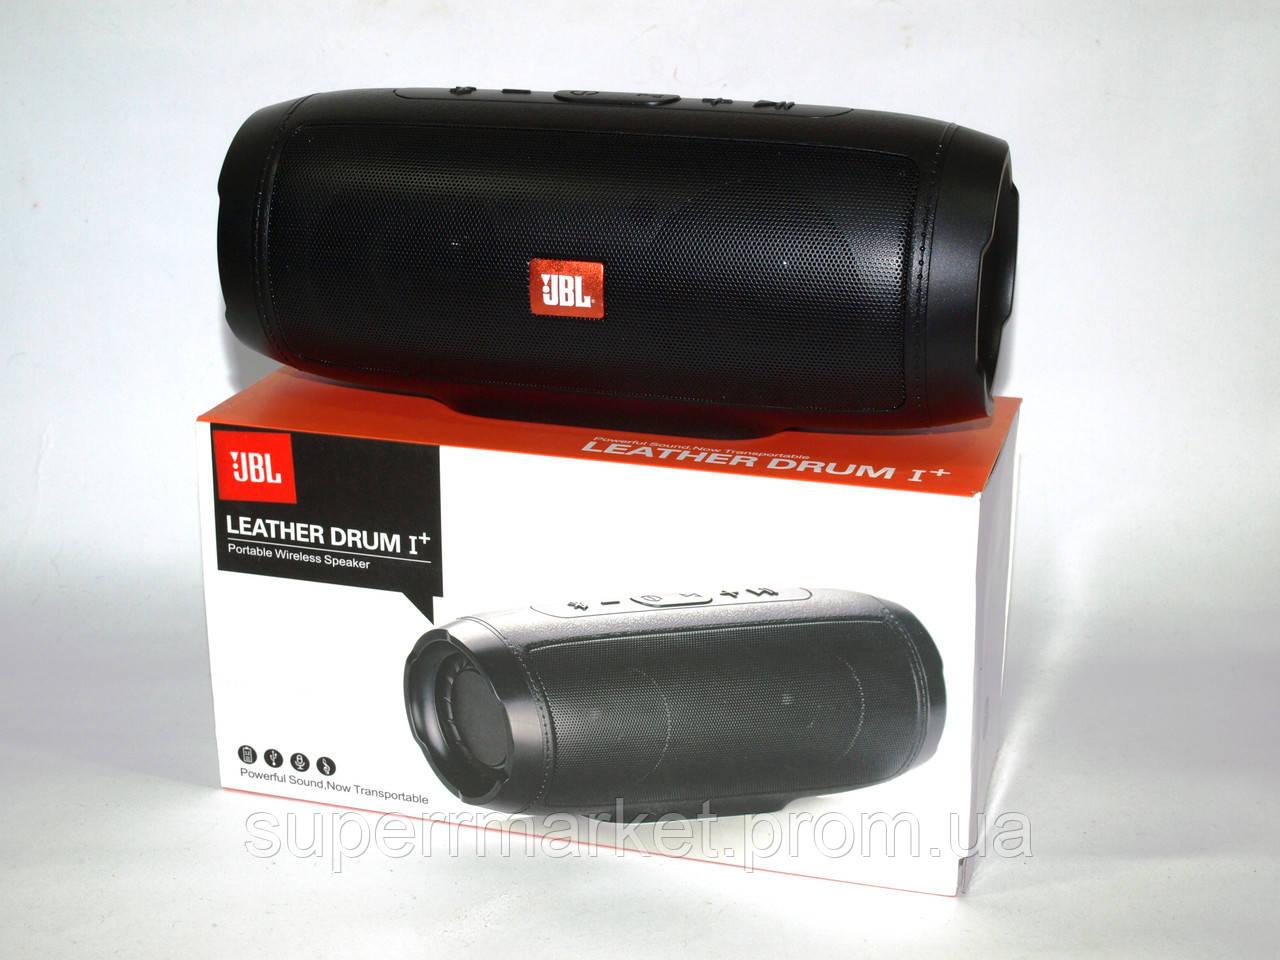 Беспроводная колонка JBL LEATHER DRUM I+ 10W с FM Bluetooth AUX MP3 USB microSD Powerbank, копия черная